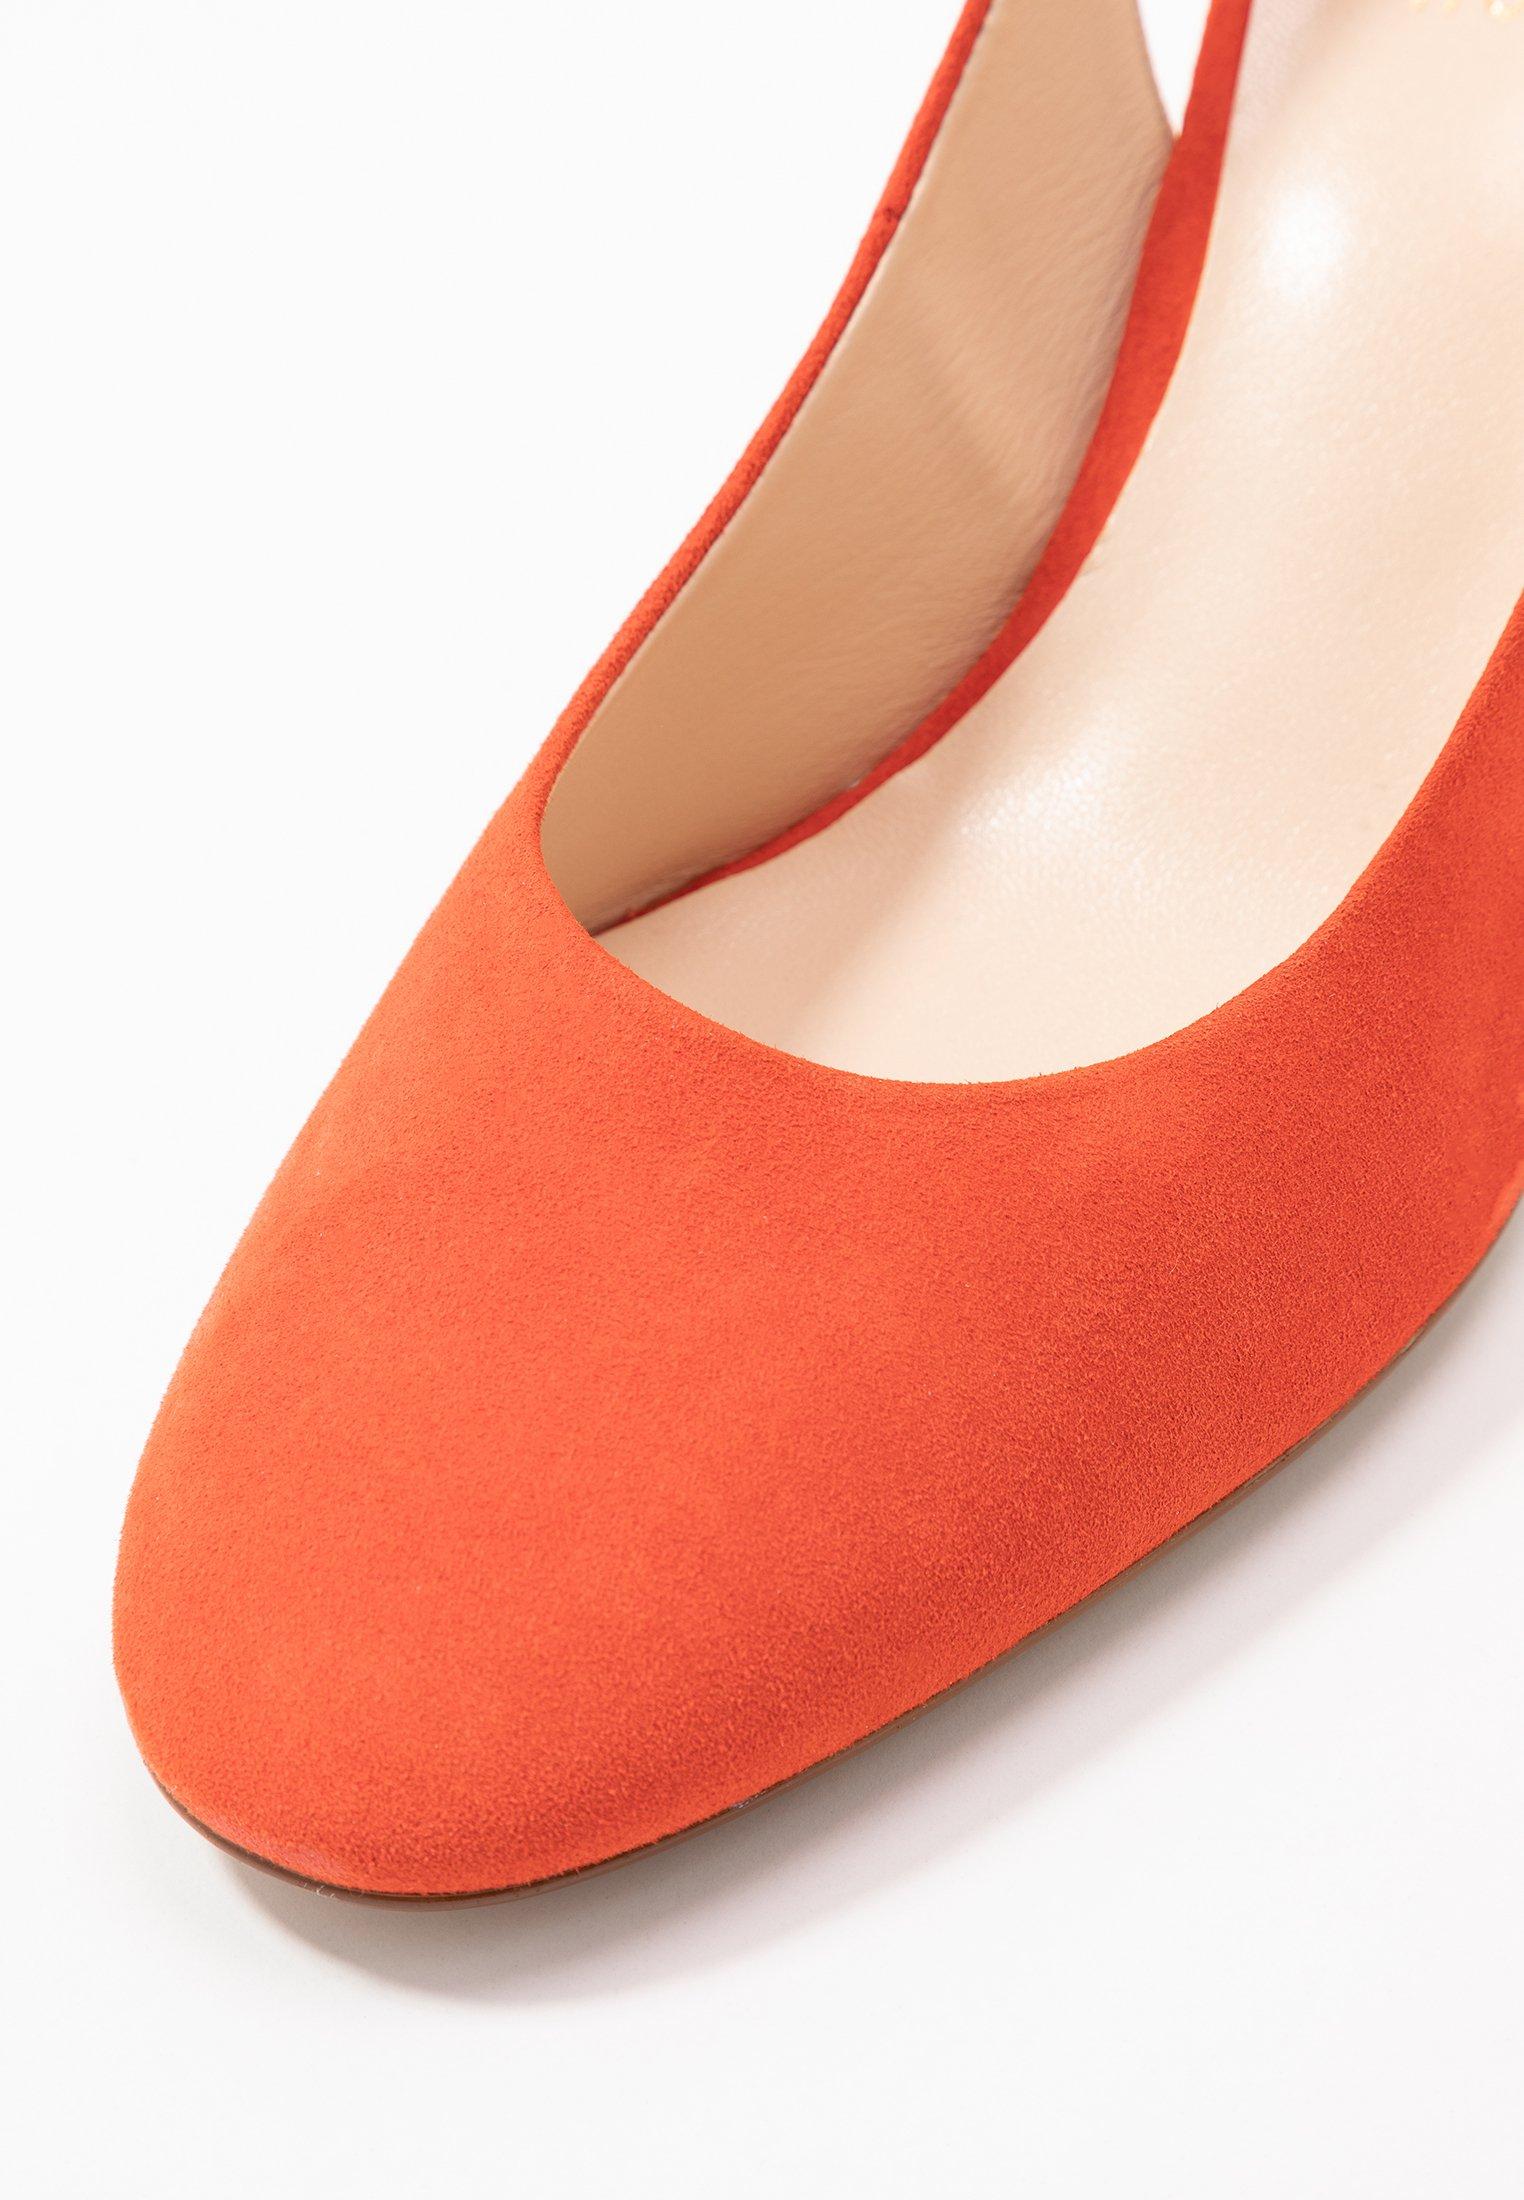 Högl Classic heels - sunrise